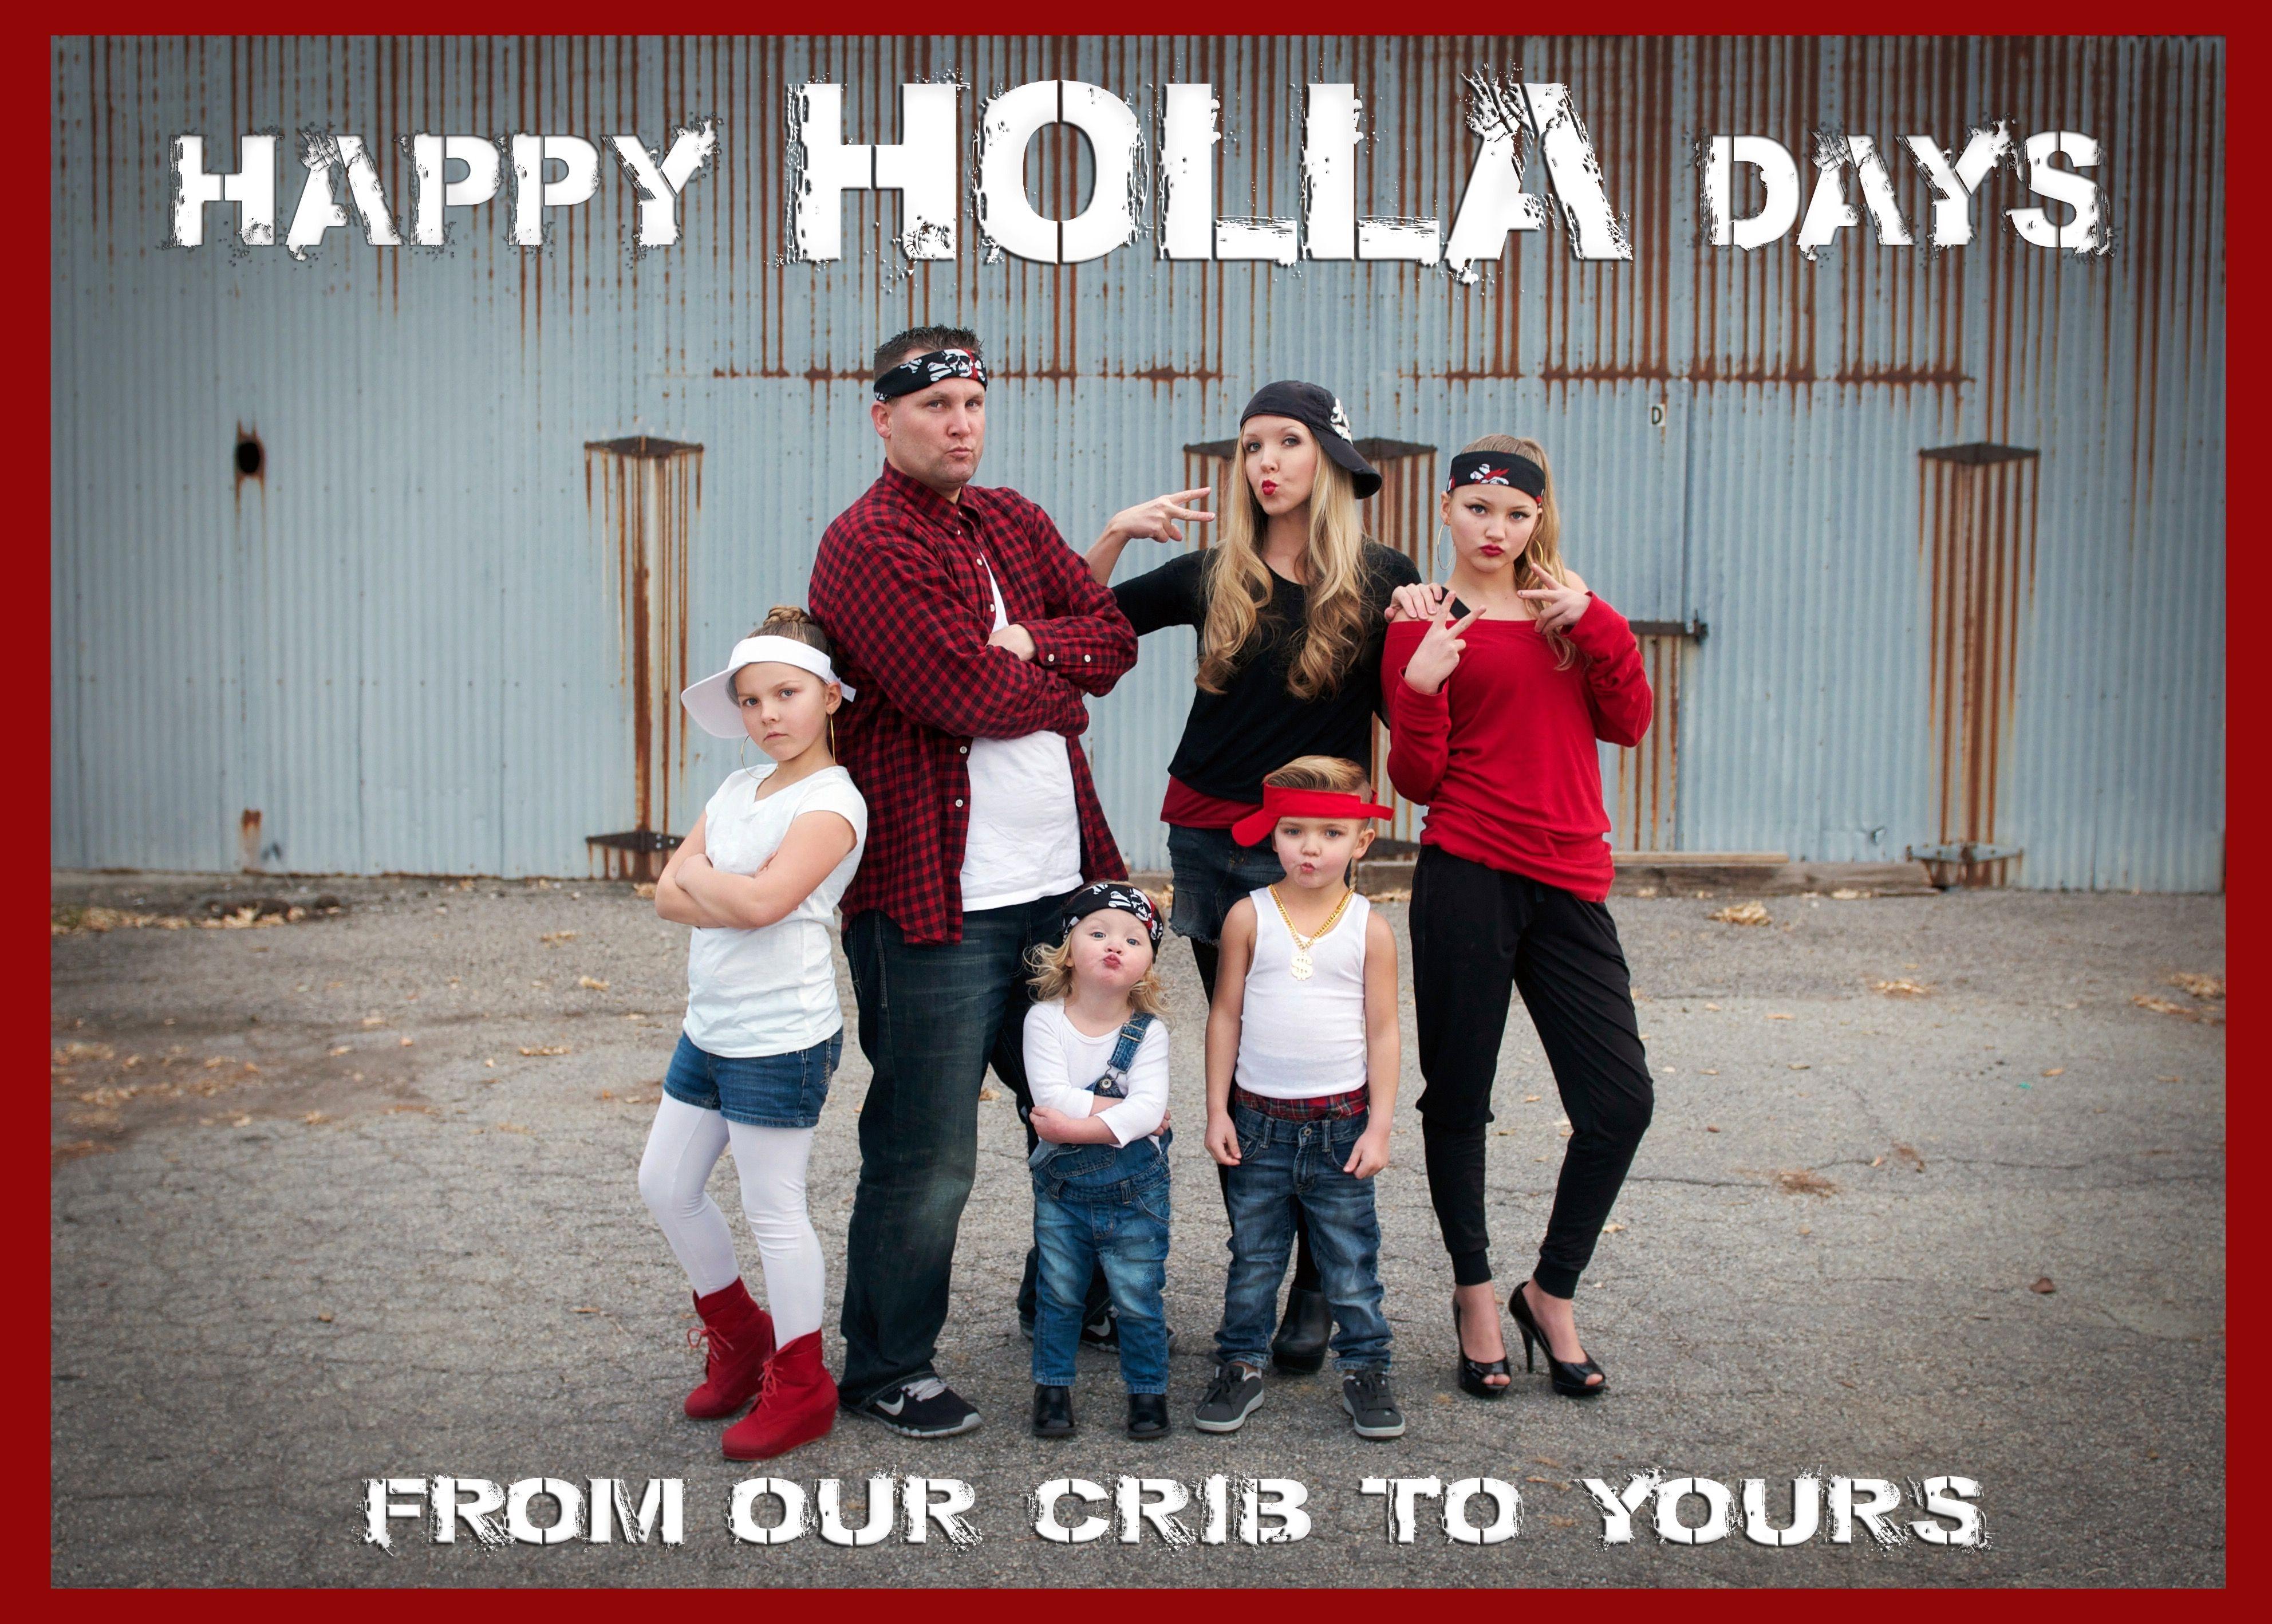 Hy Holla Days Funny Christmas Card